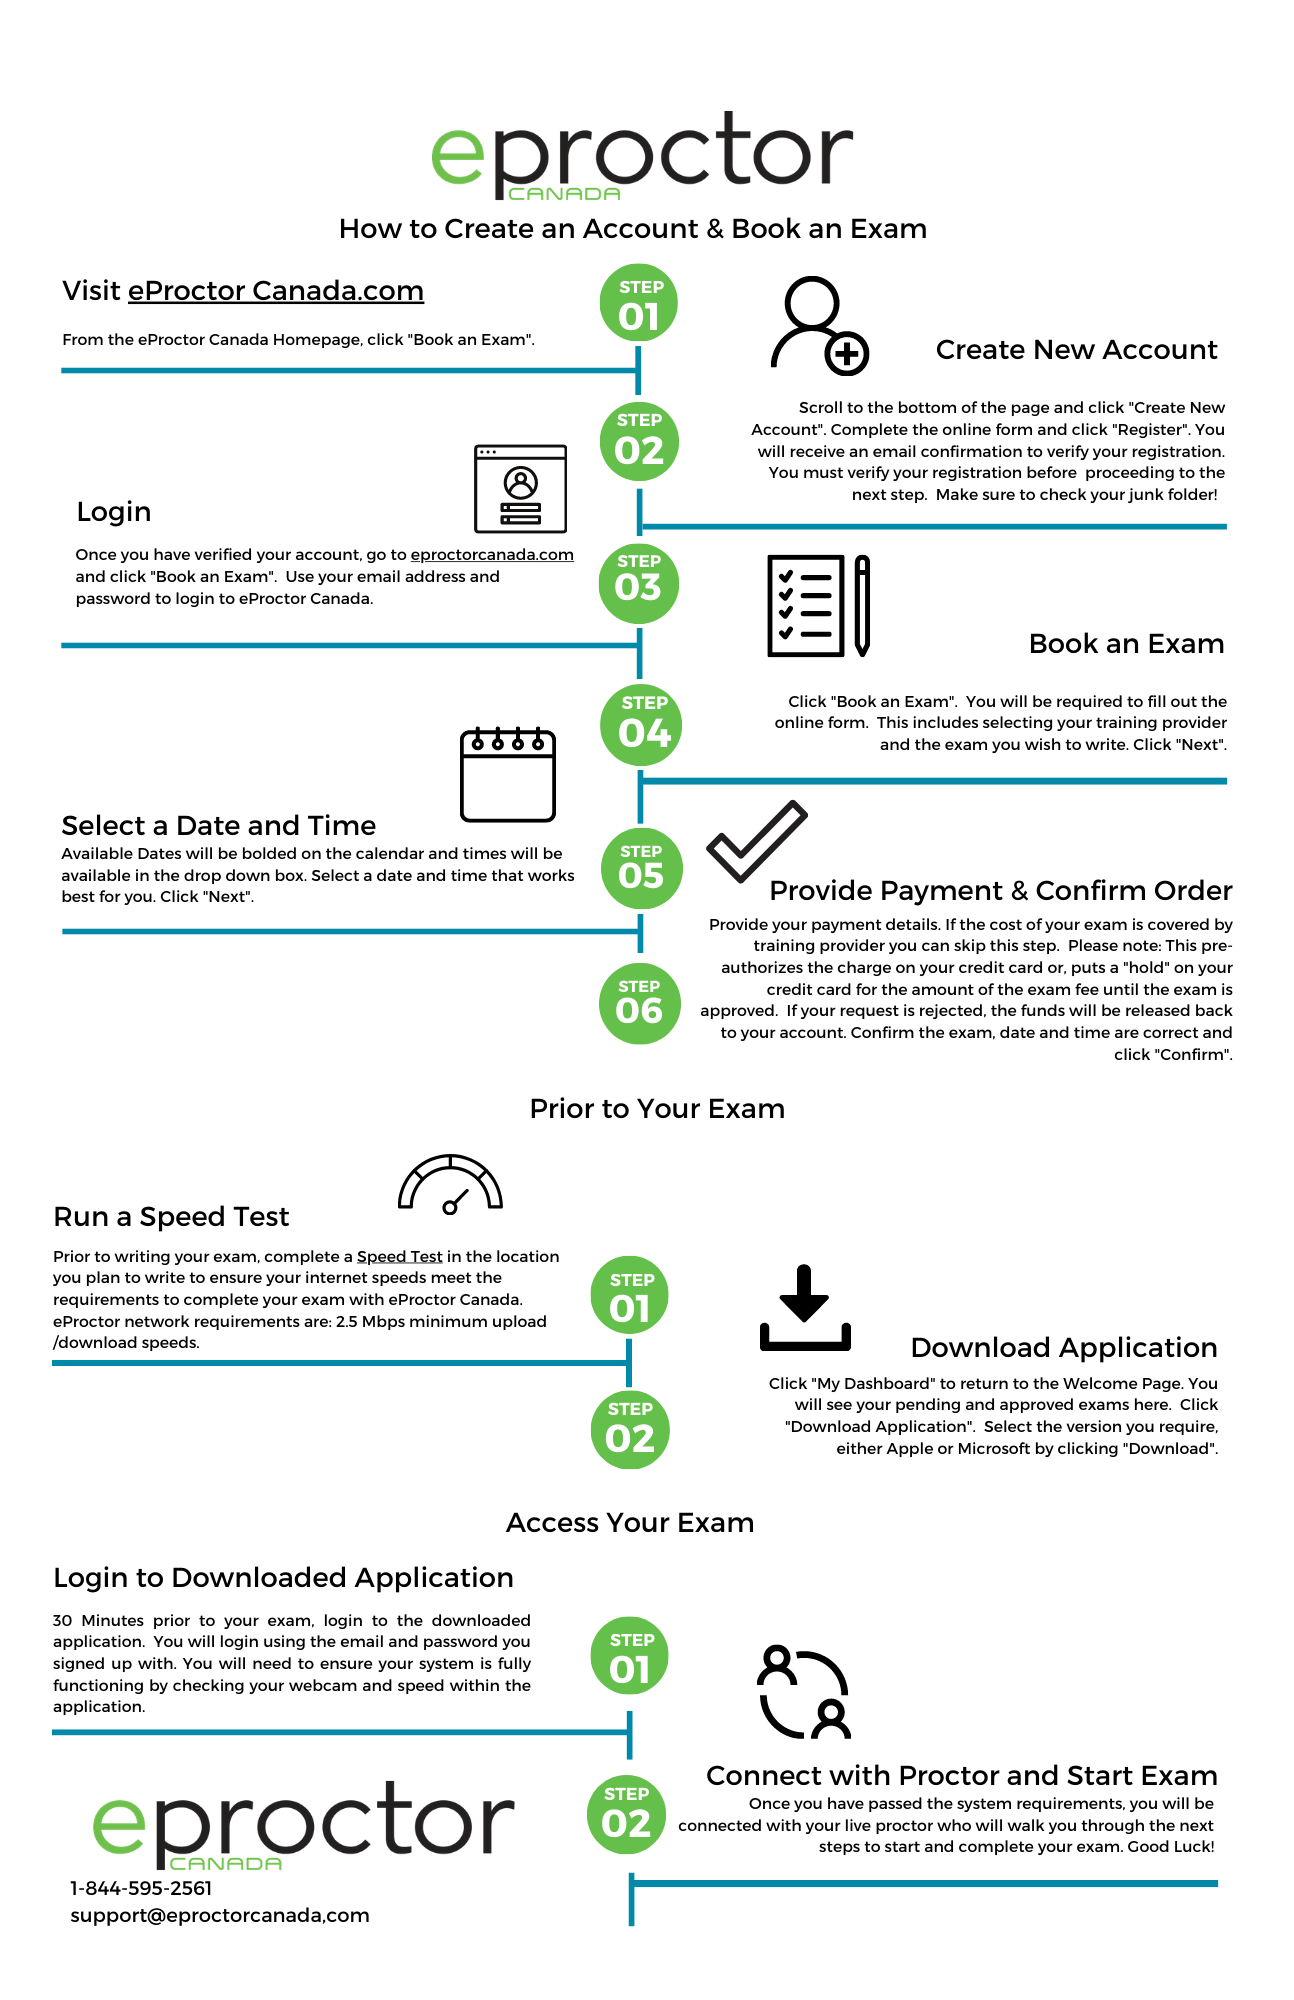 Copy of eProctor Steps